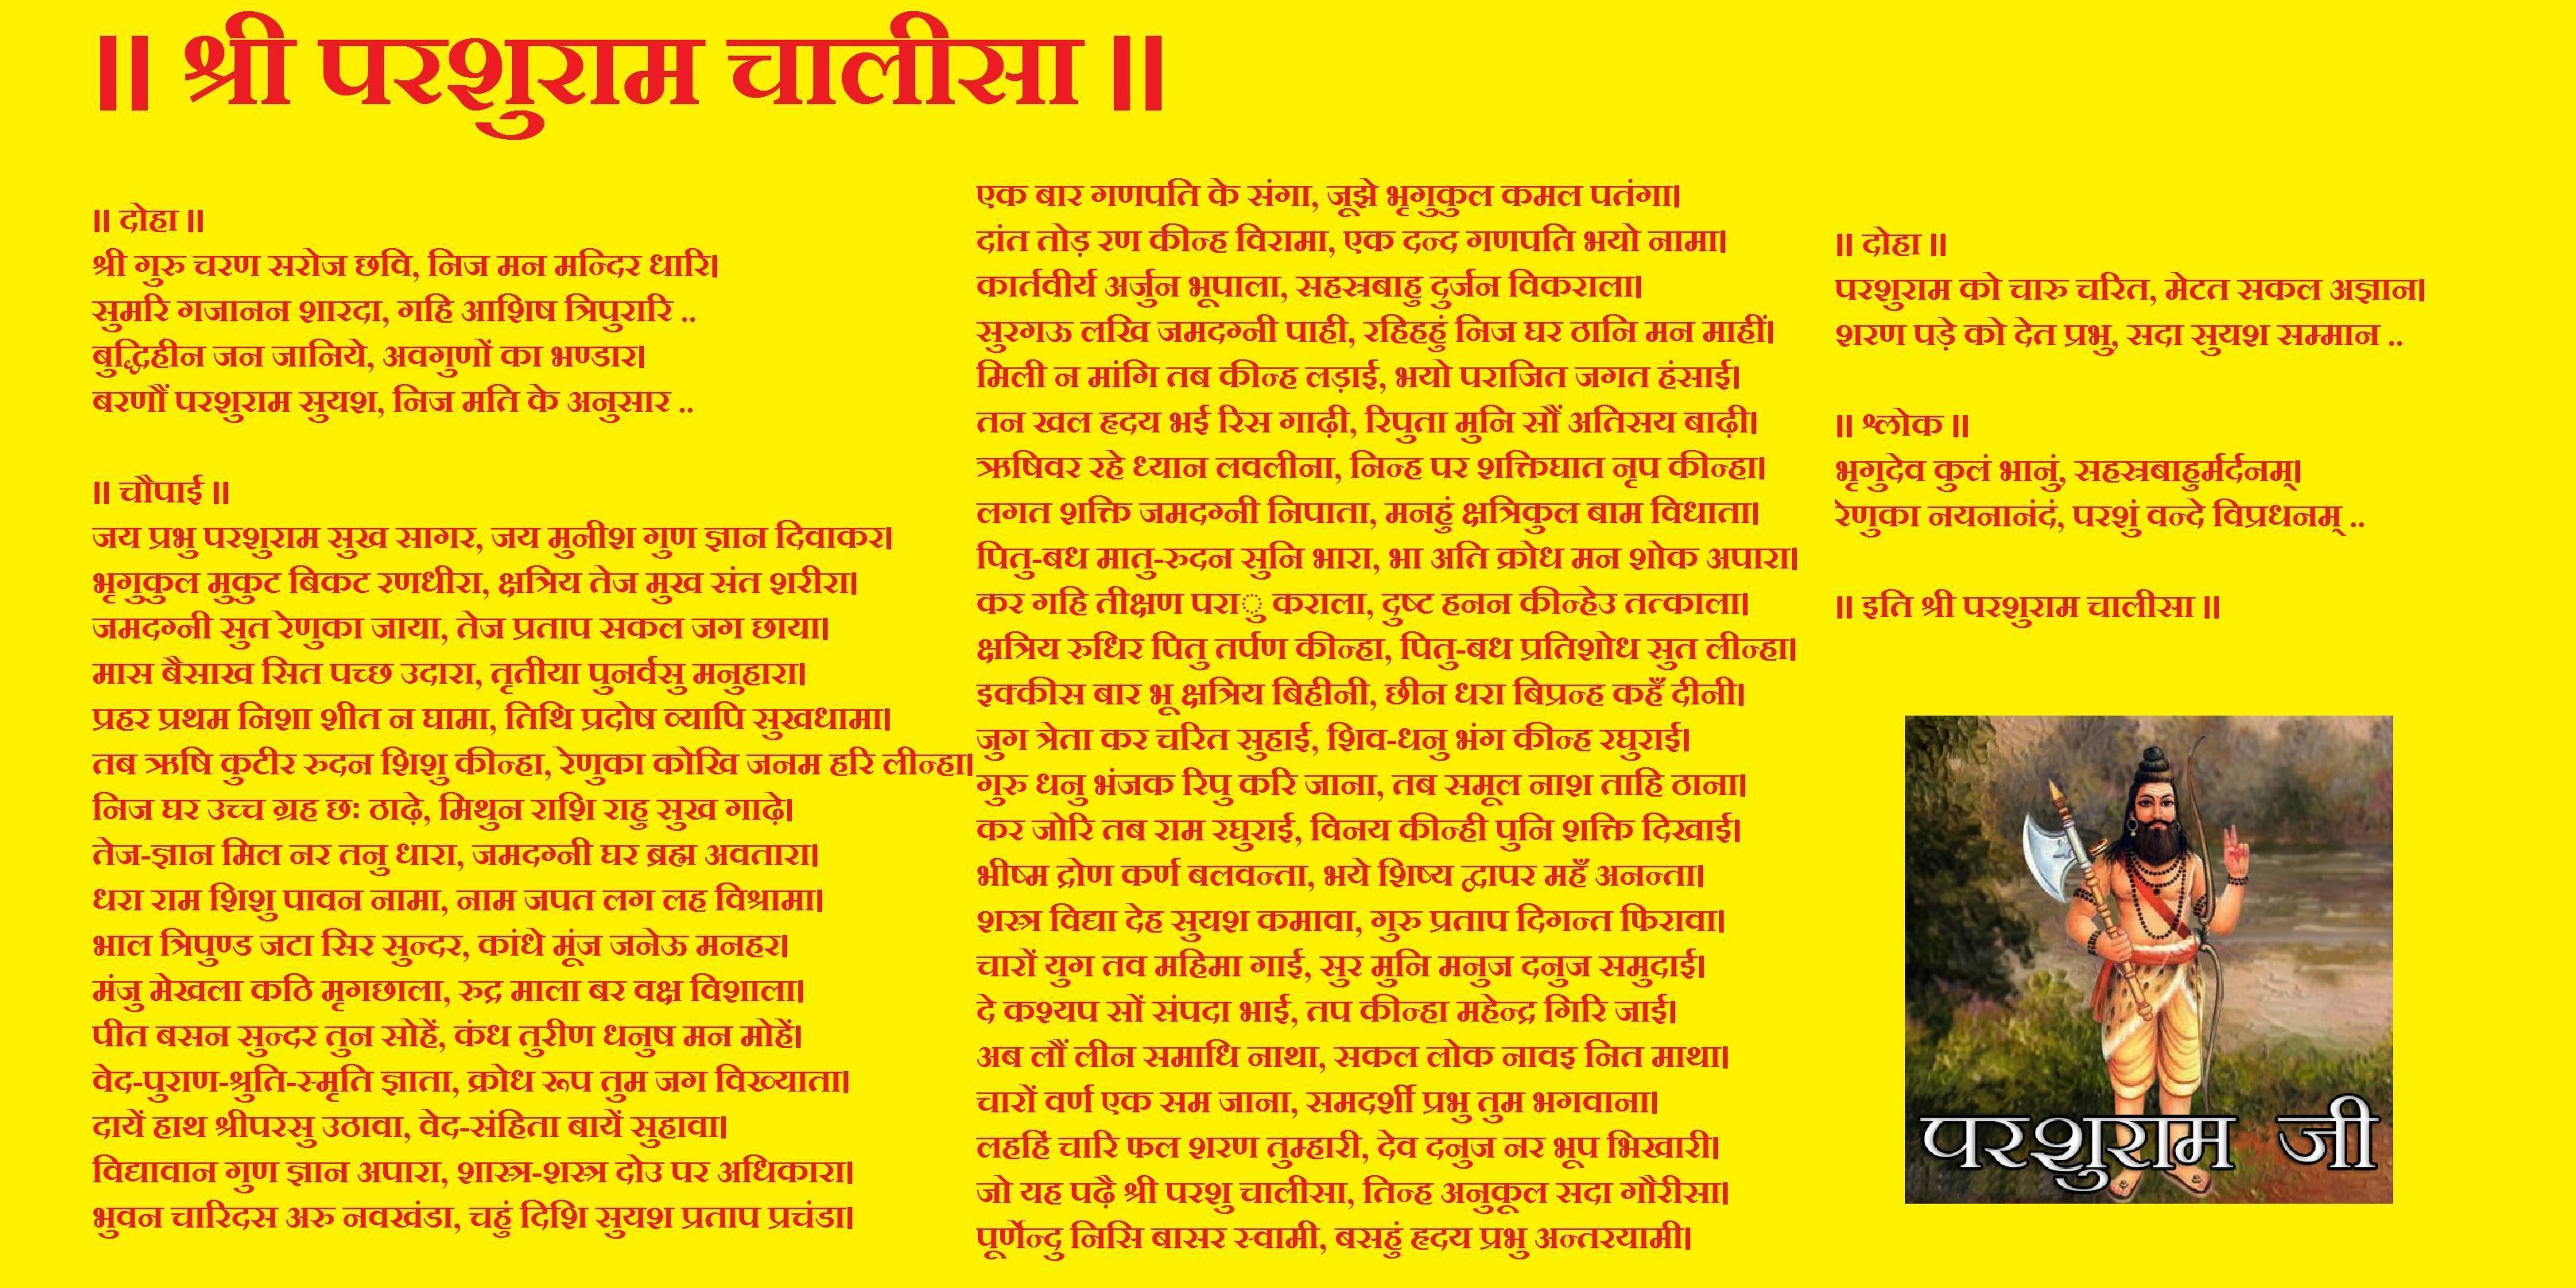 श्री परशुराम चालीसा | INDIAN STATES AND IMPORTANT FESTIVALS